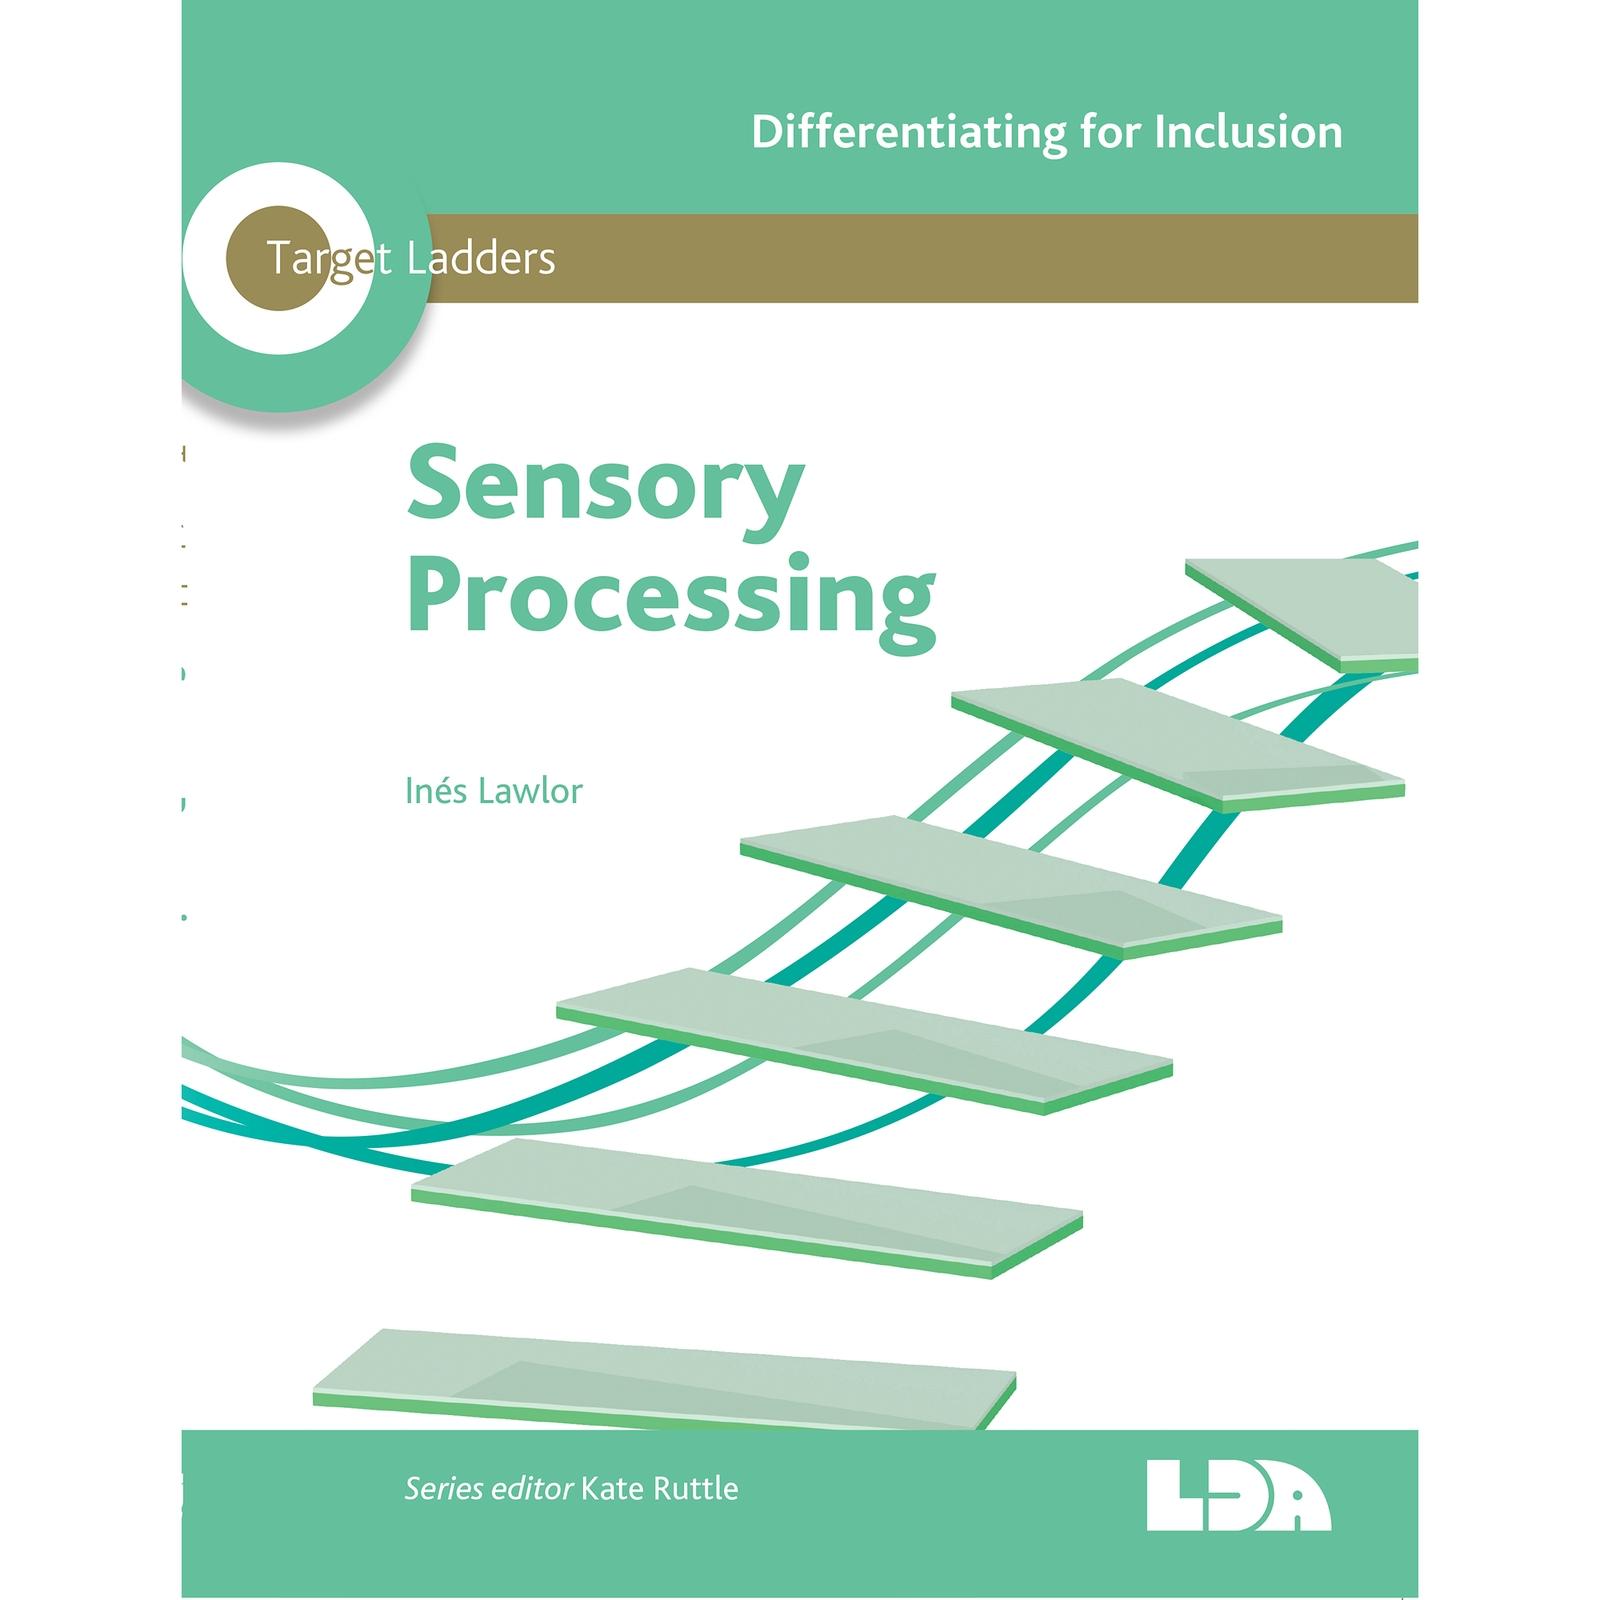 Target Ladders Sensory Processing